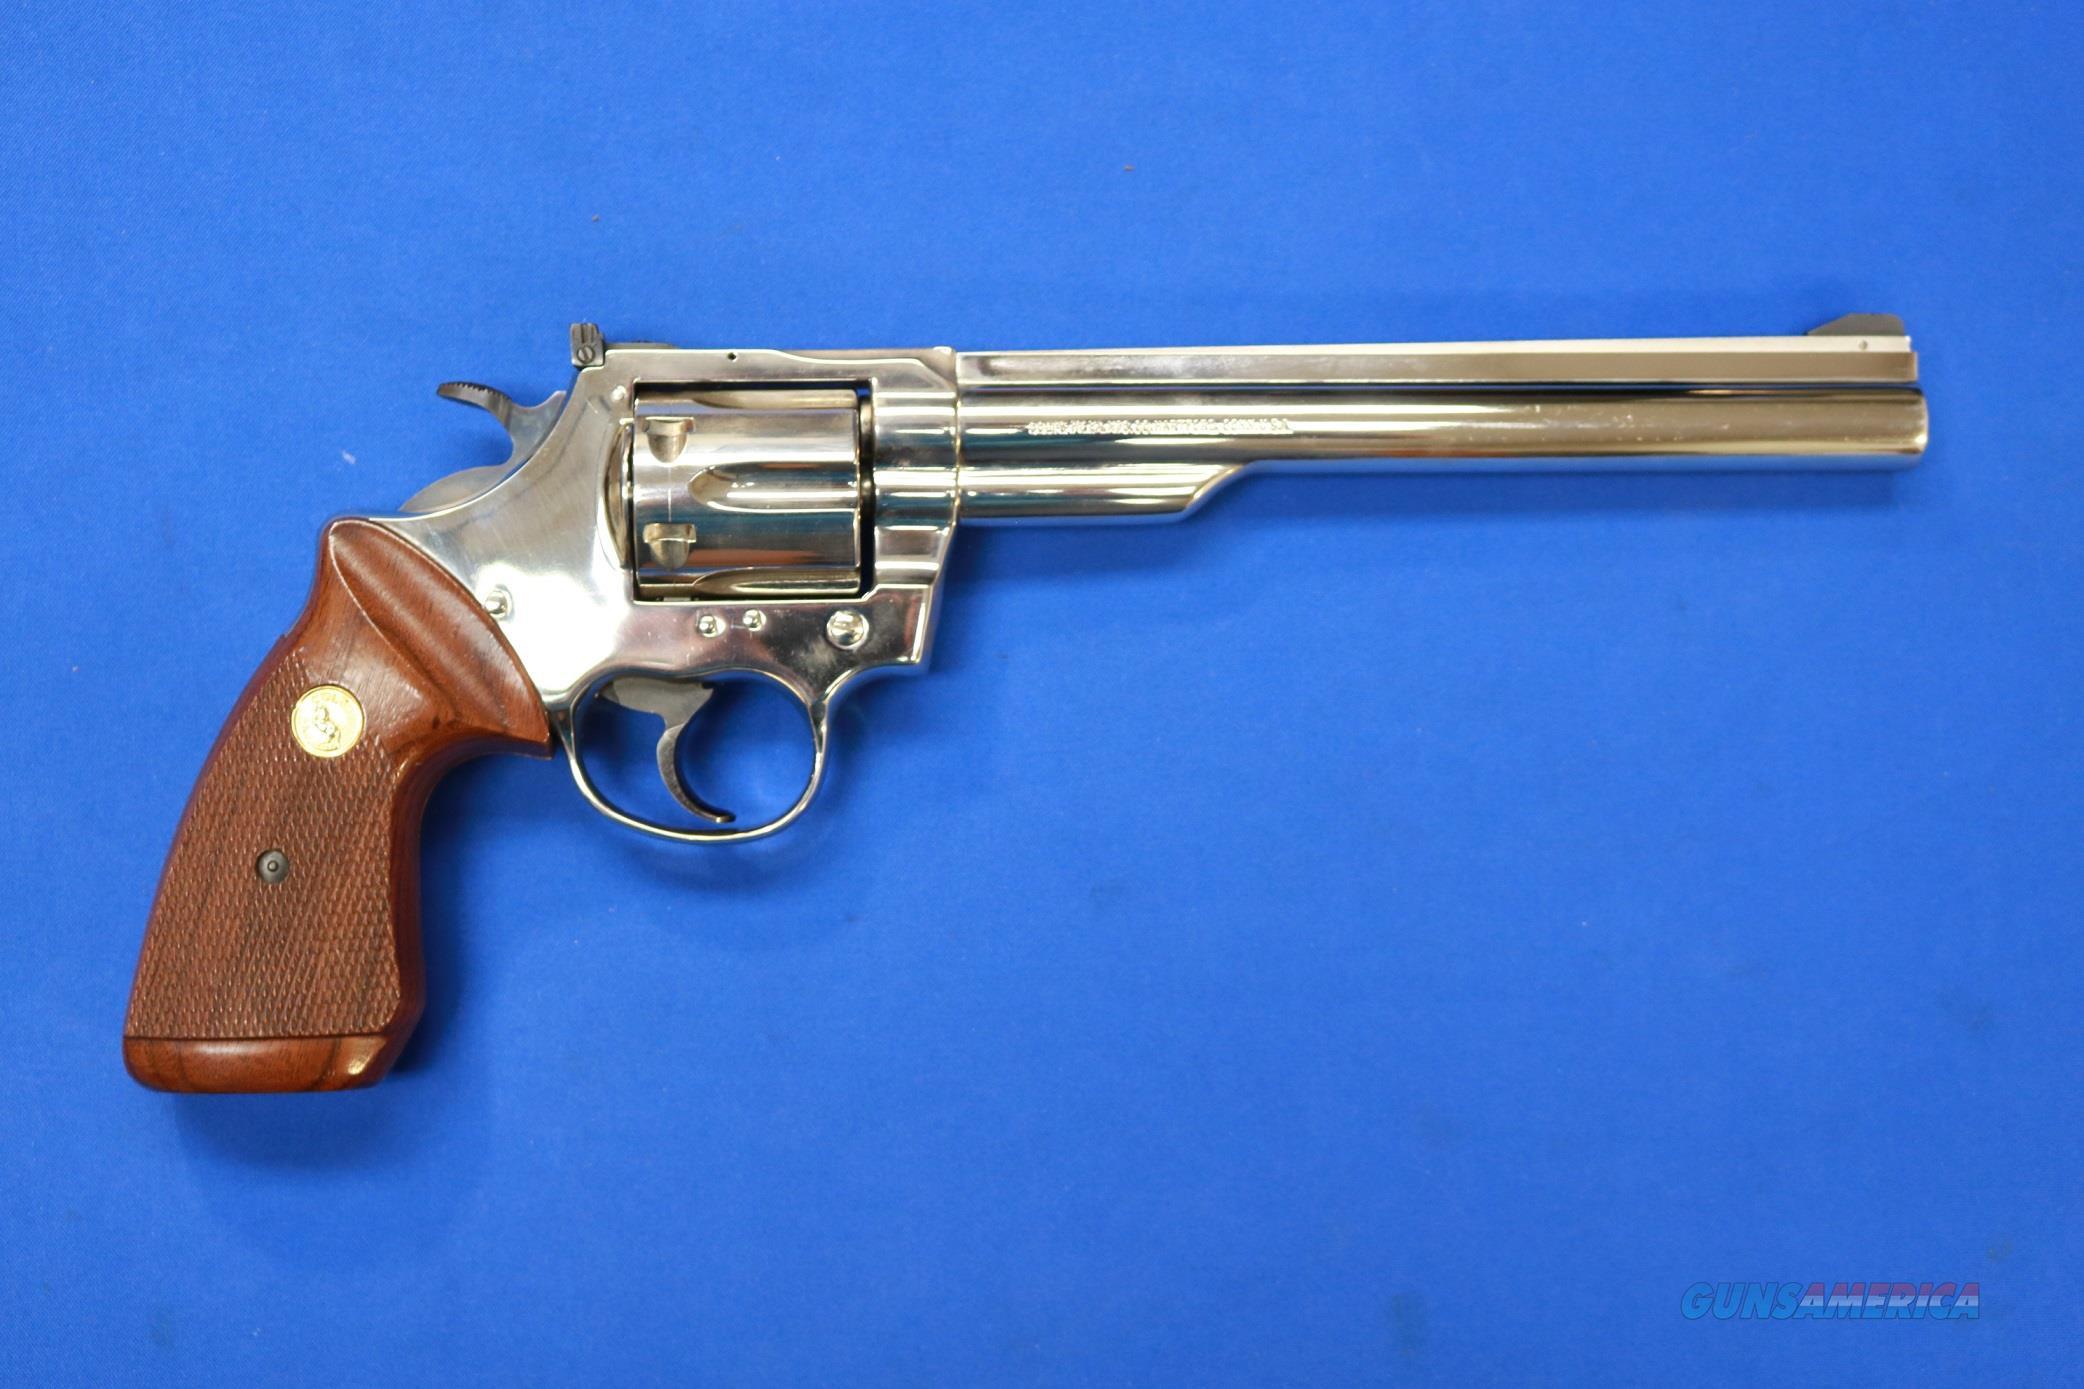 "COLT TROOPER Mk III NICKEL .357 MAG 8"" - 1981 Mfg.  Guns > Pistols > Colt Double Action Revolvers- Modern"